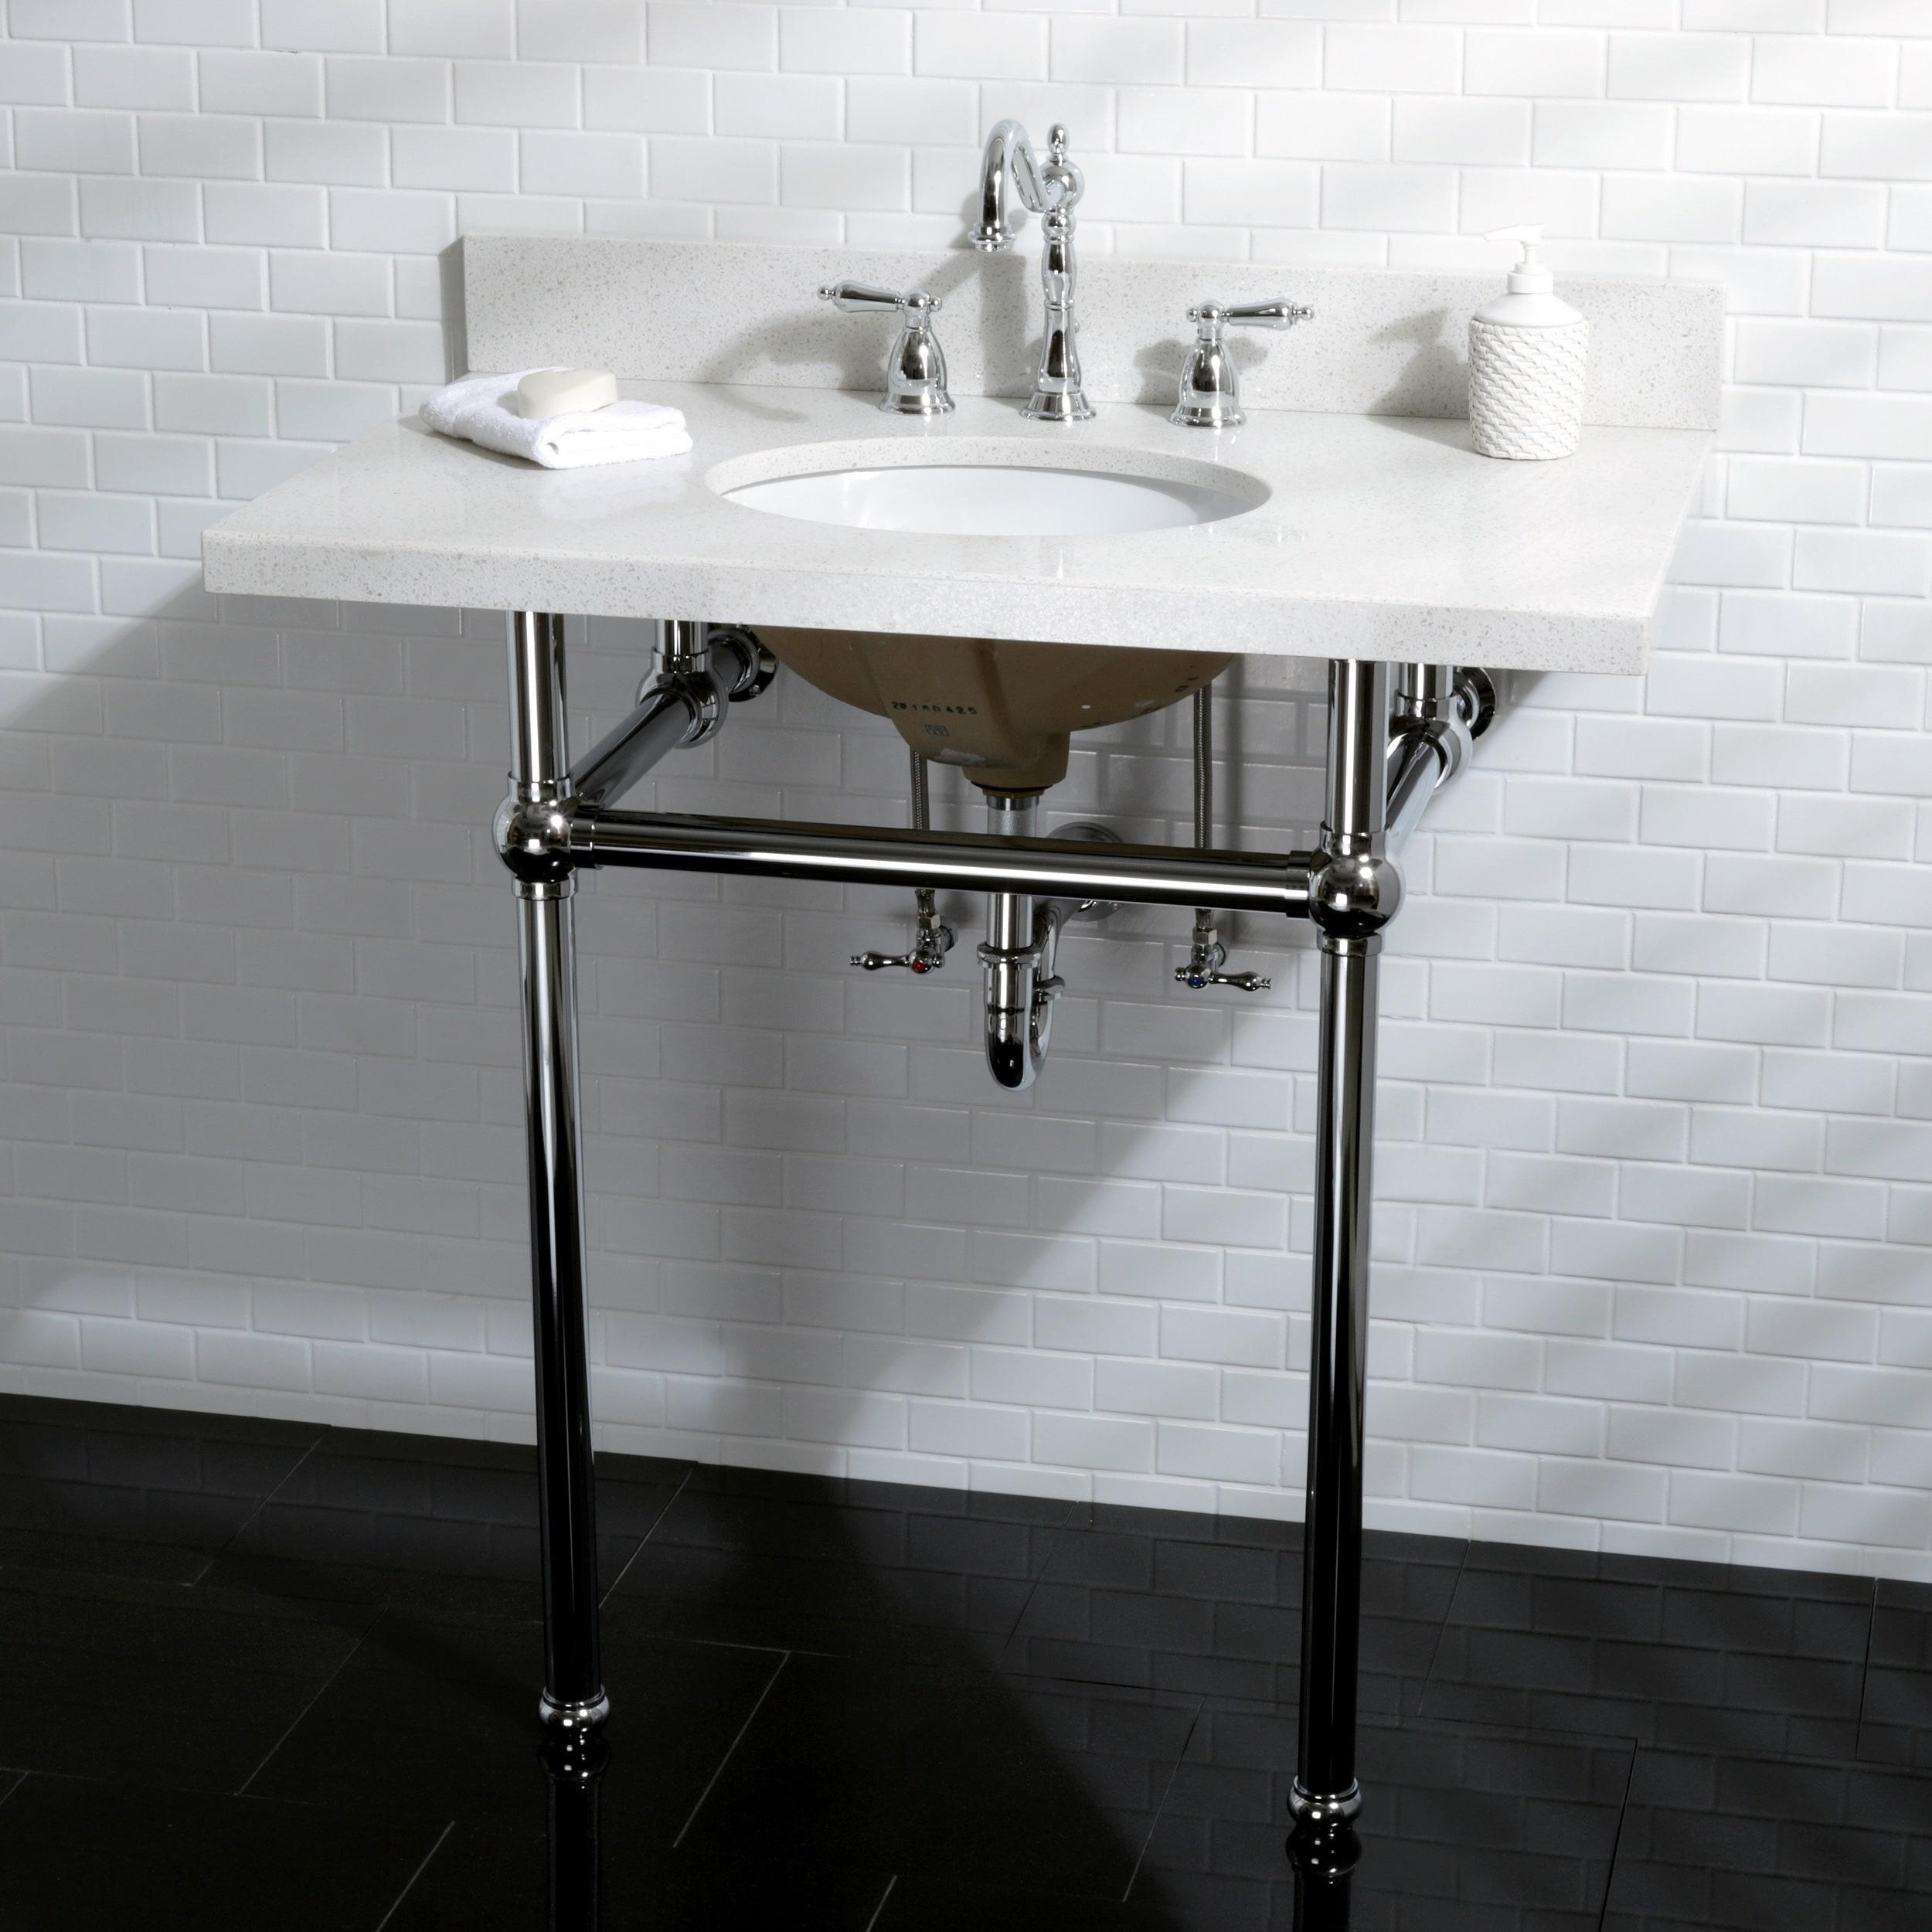 White Quartz 36-inch Wall-mount Pedestal Bathroom Sink